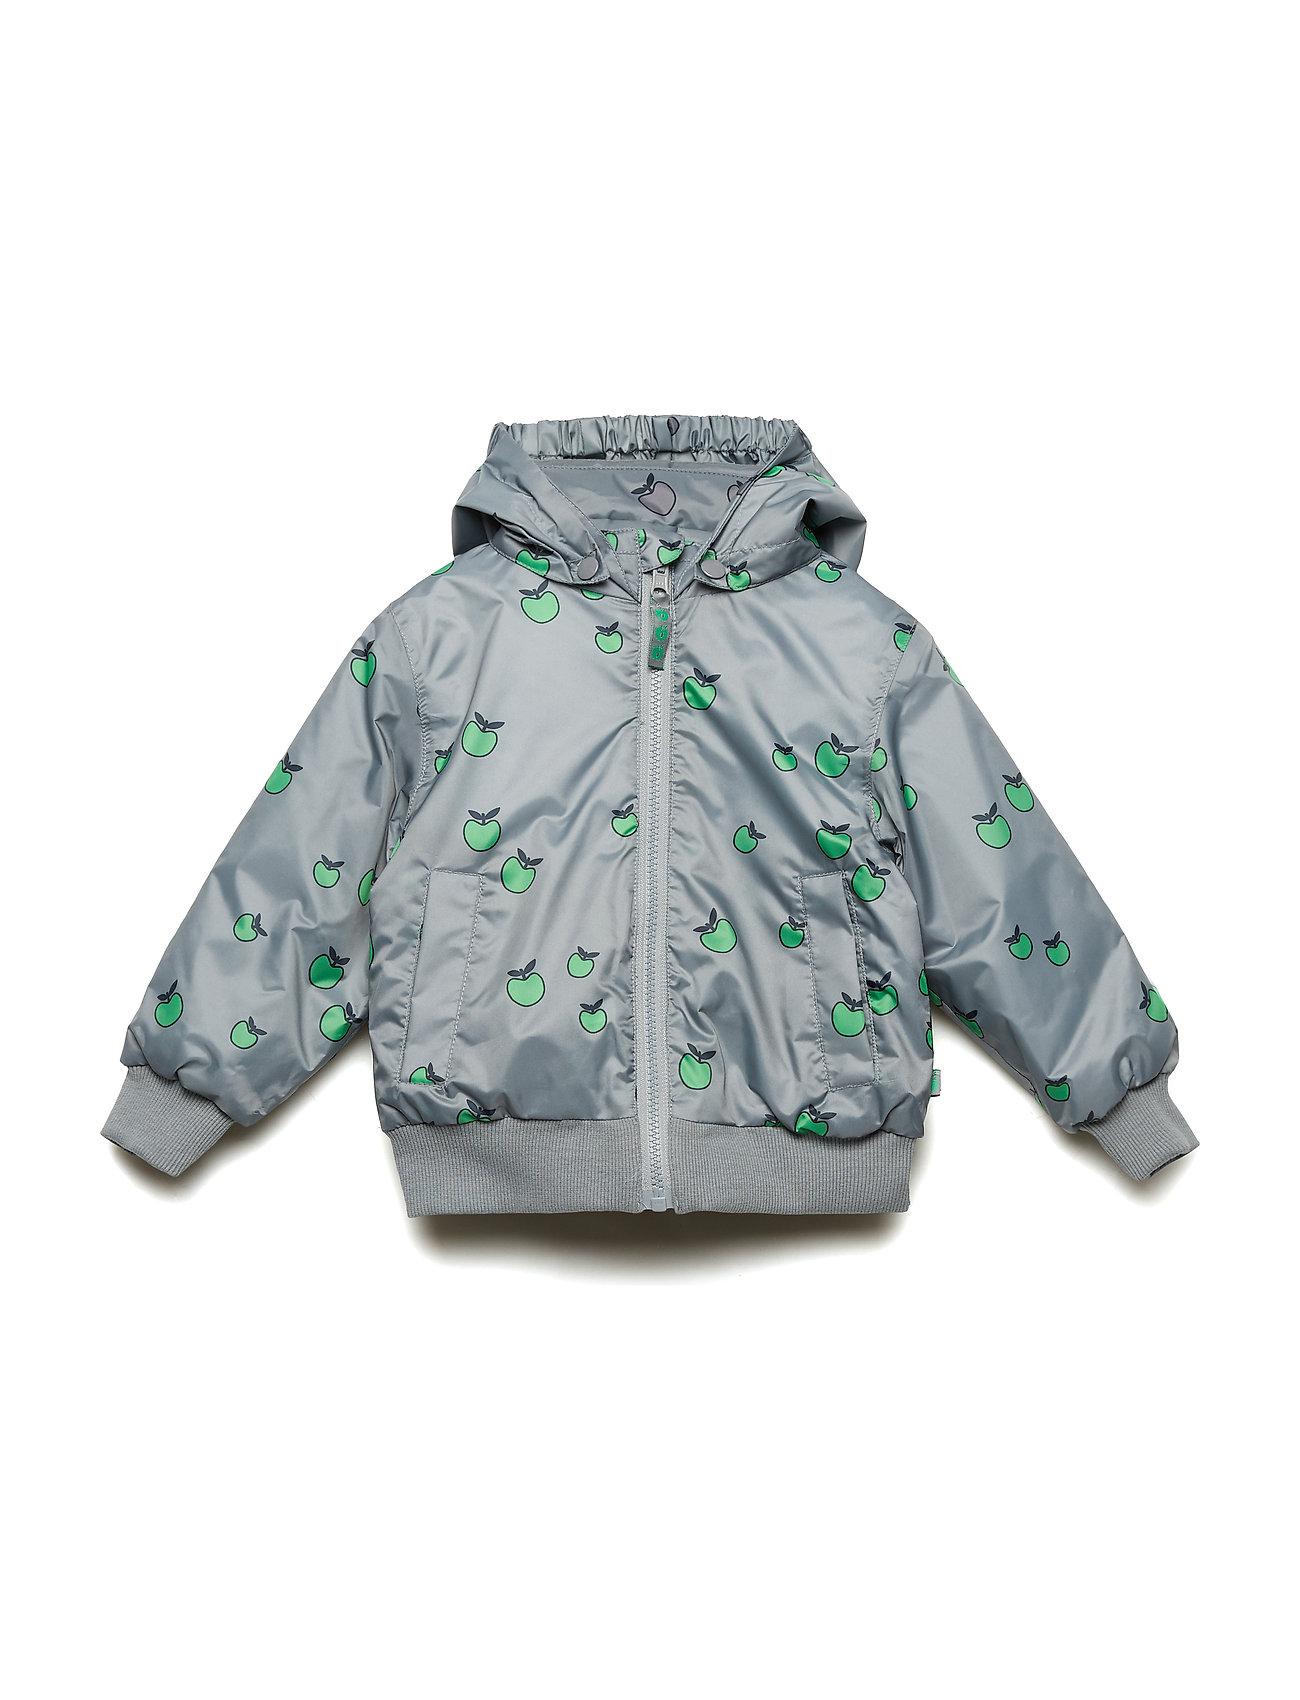 f2563ee827008 Padded Turnable Jacket. Apple (Apple Green) (£44.40) - Småfolk ...